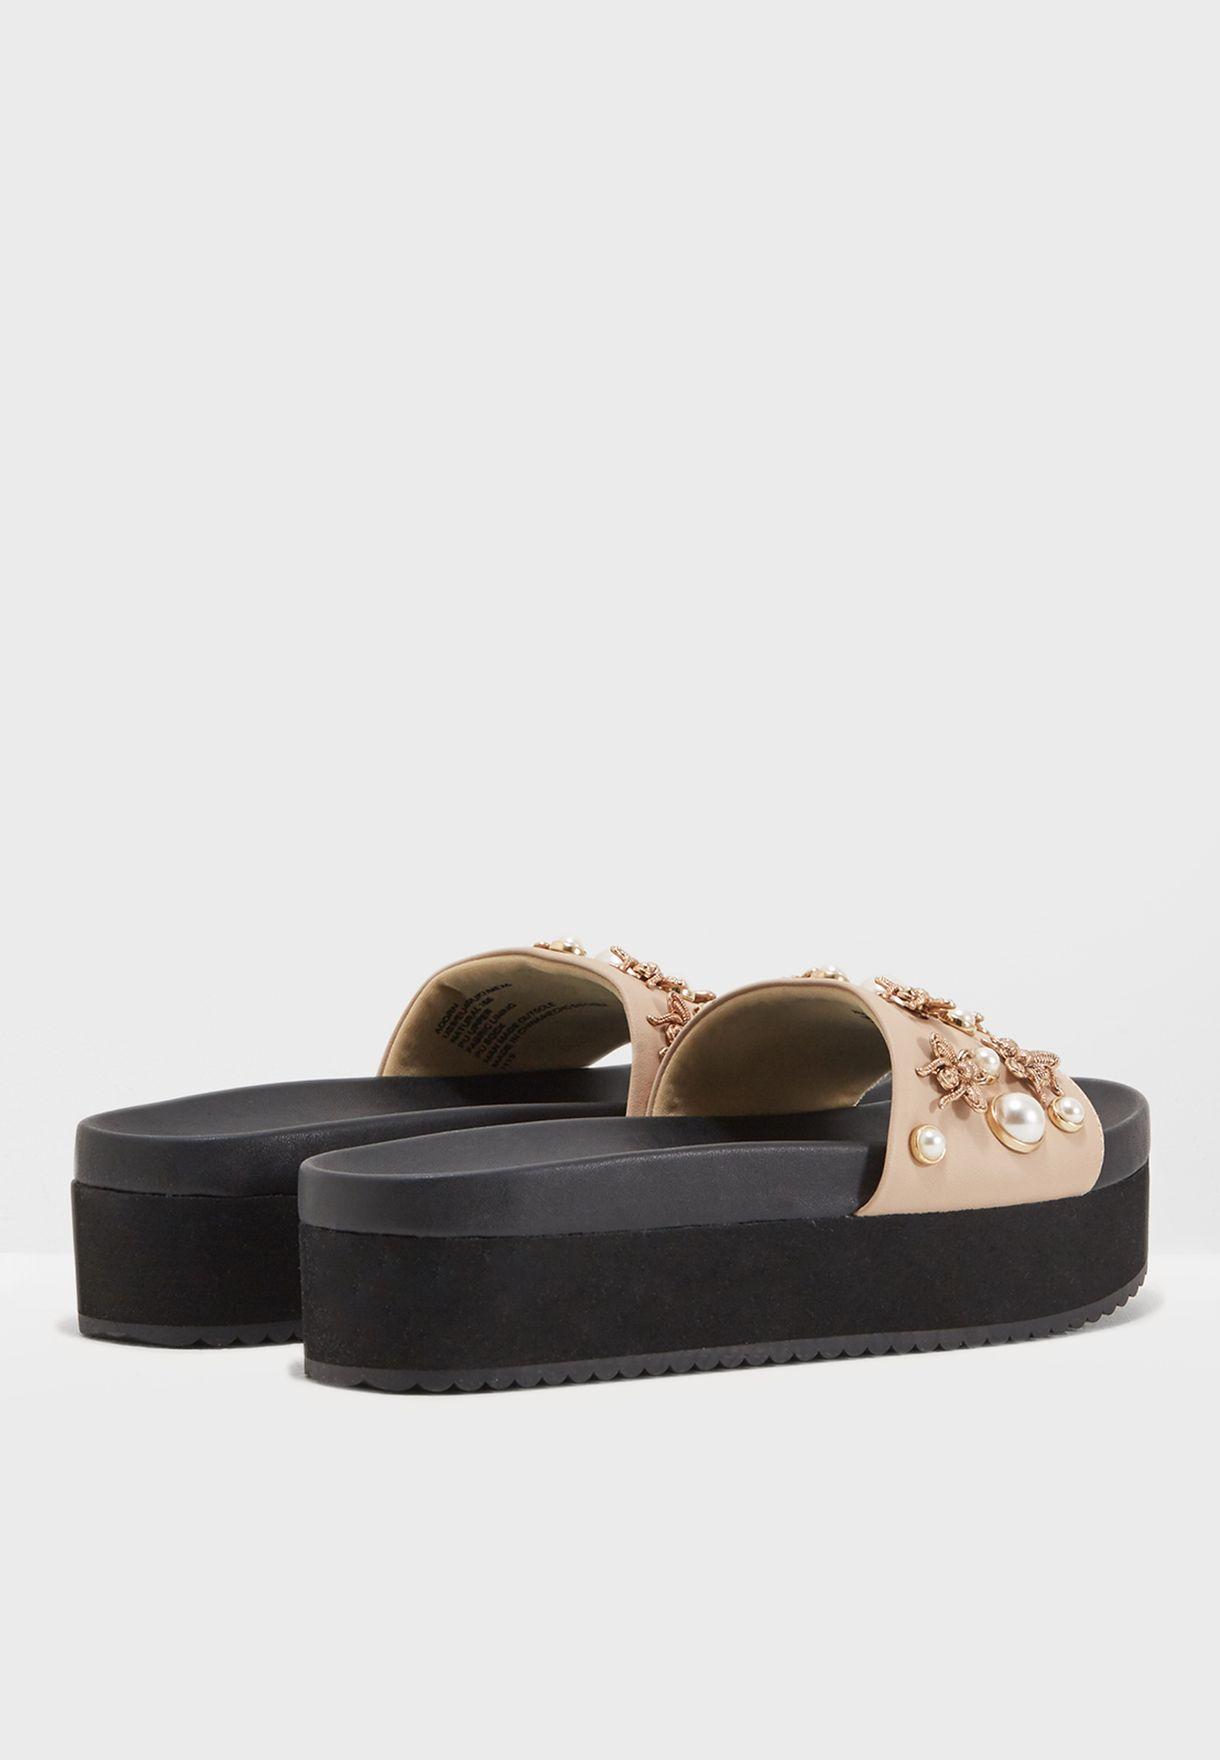 f0c86bb7e58 Shop Steve Madden beige Adorn Flat Sandals ADORN for Women in ...